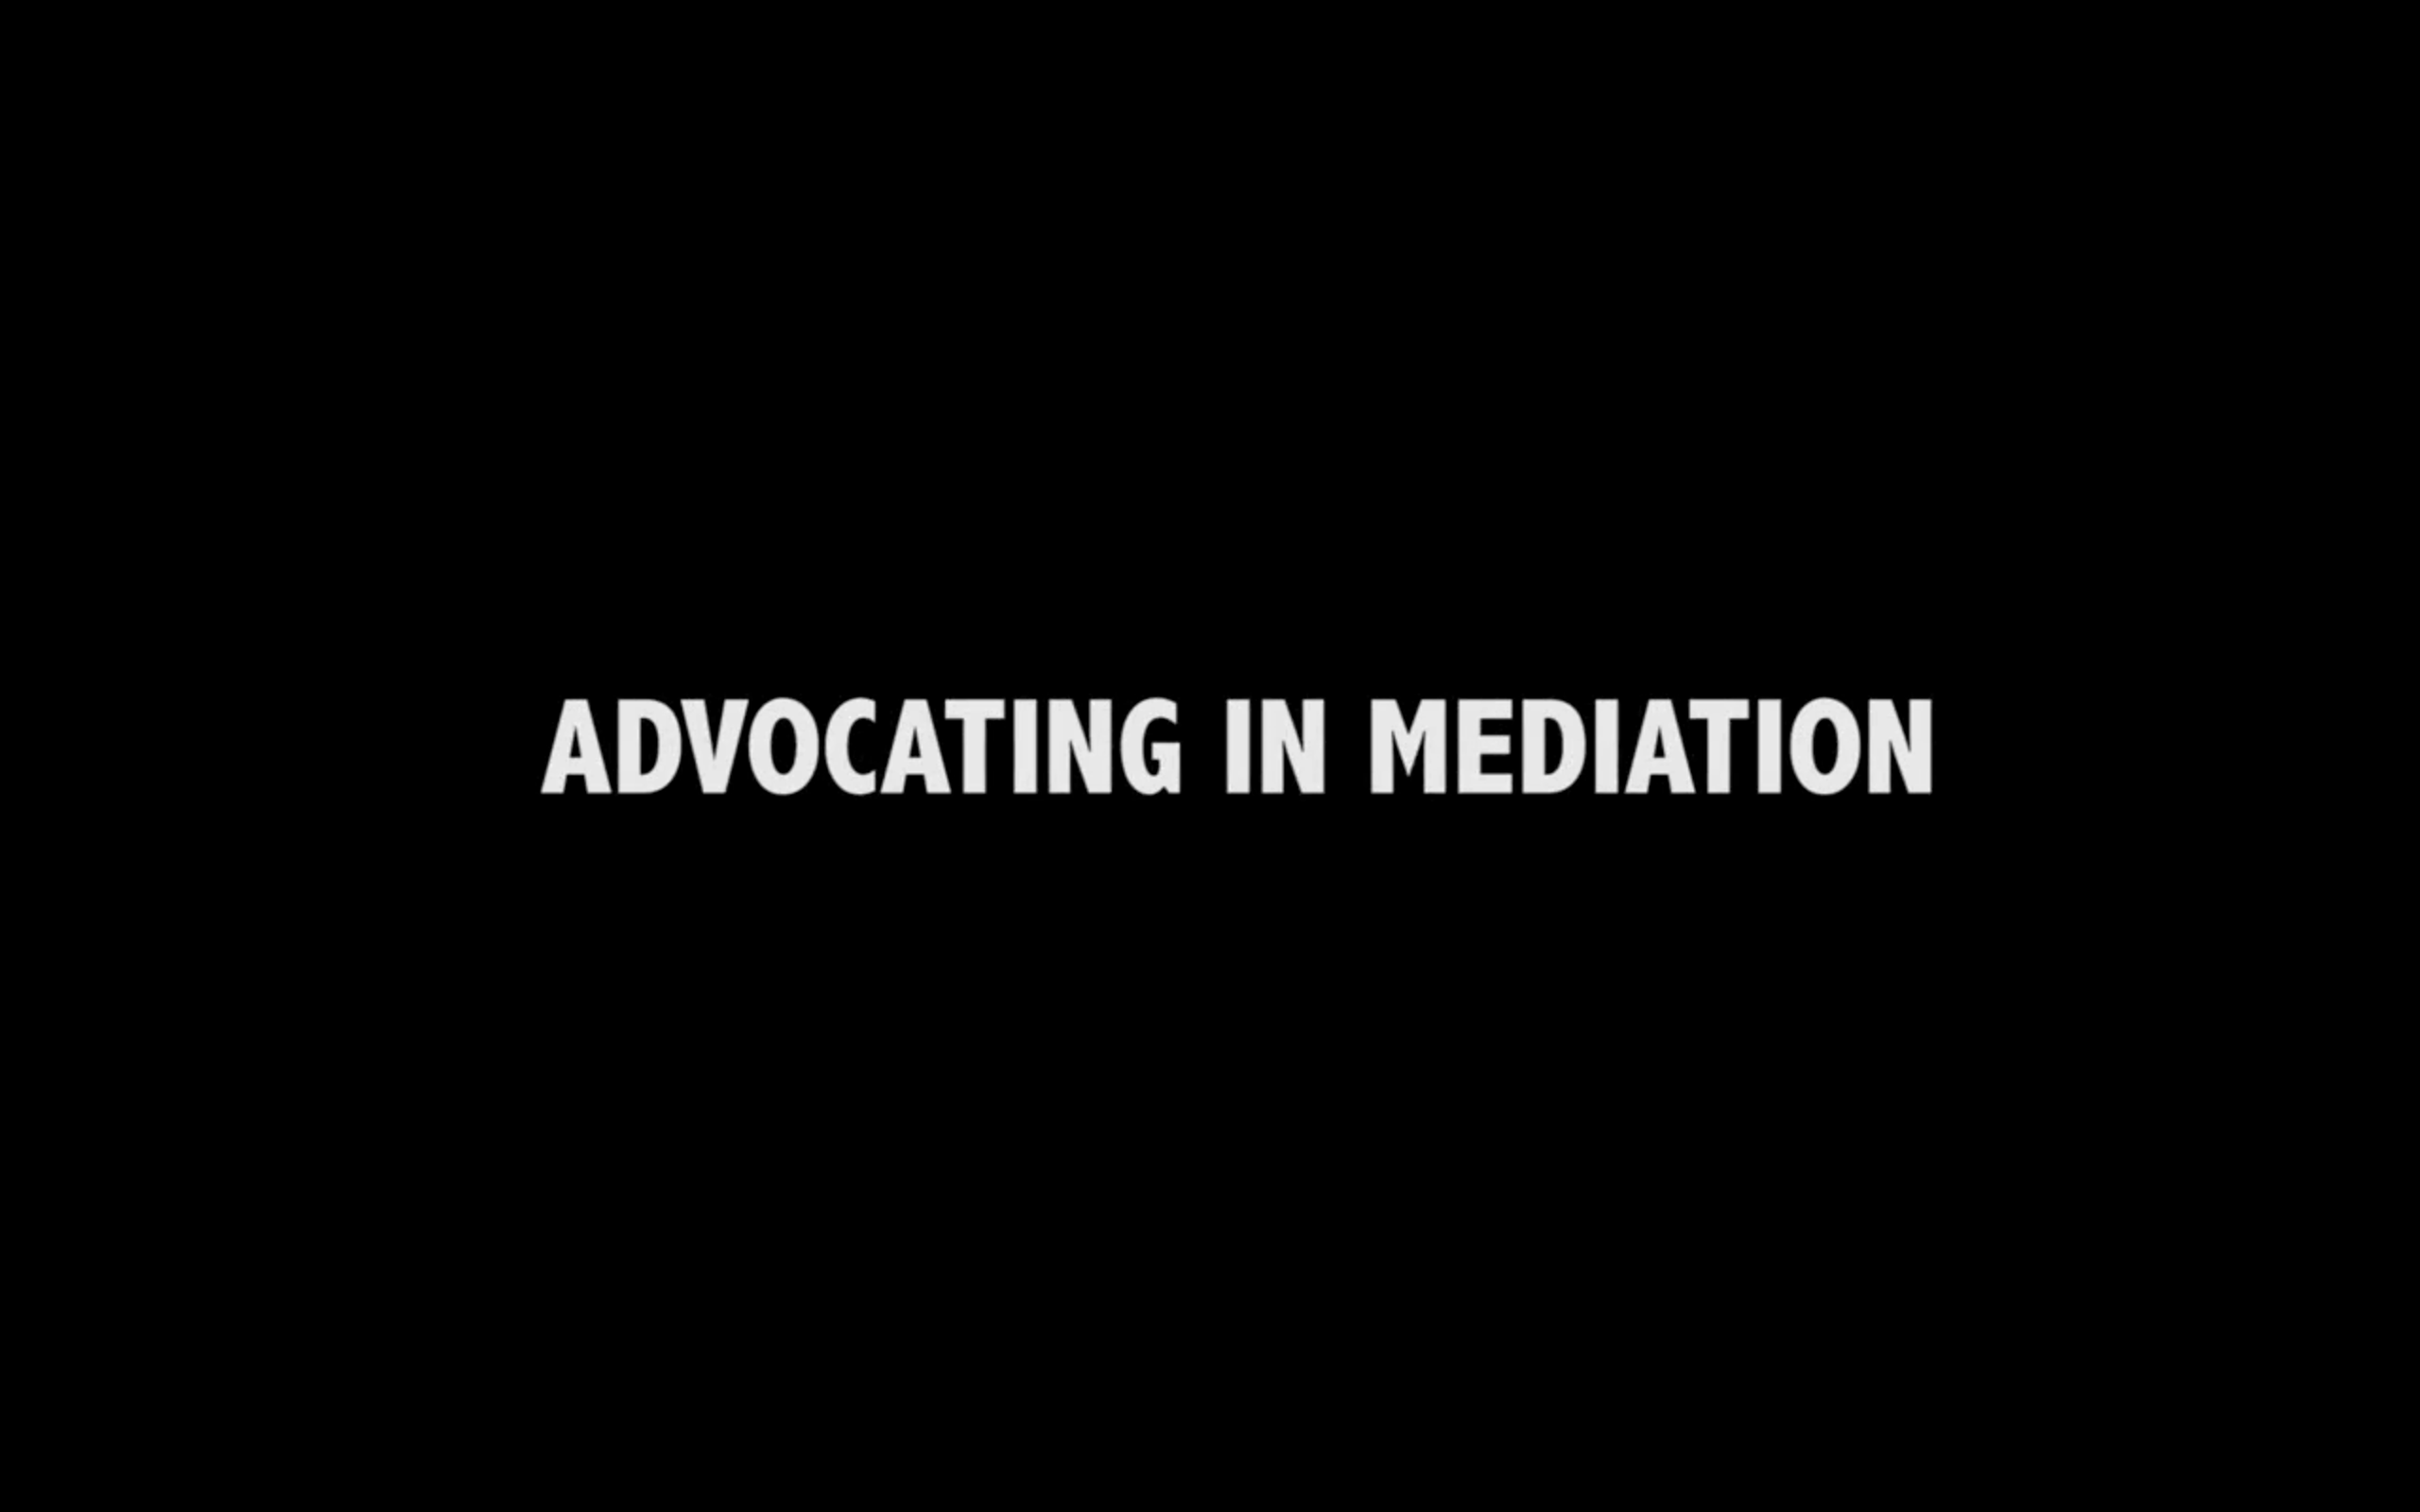 Advocating in Mediation